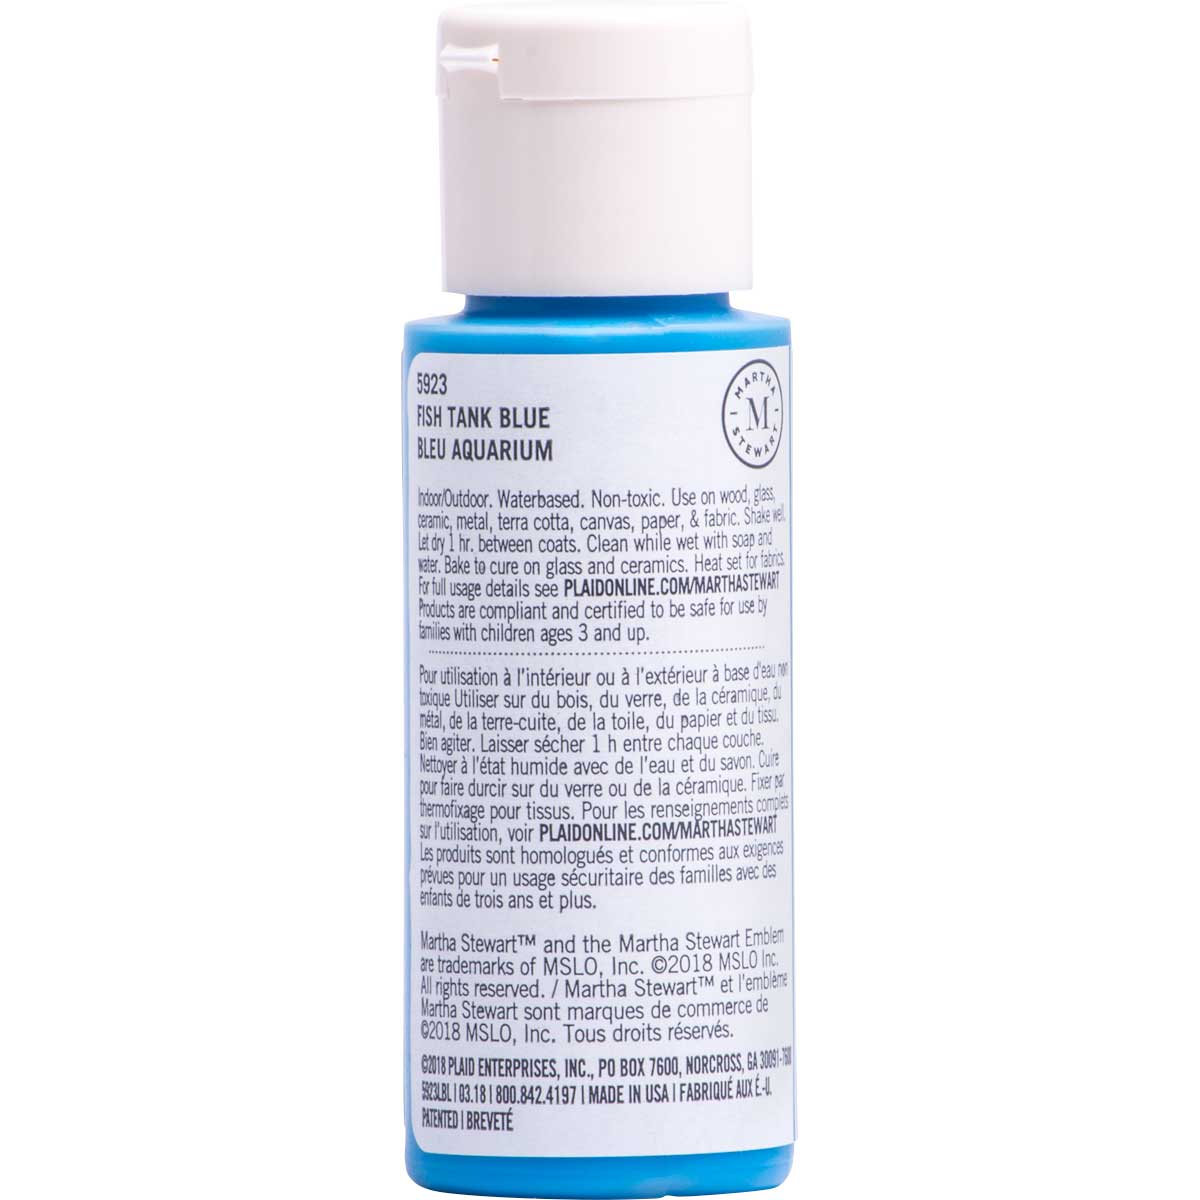 Martha Stewart ® Multi-Surface Satin Acrylic Craft Paint CPSIA - Fish Tank Blue, 2 oz. - 5923